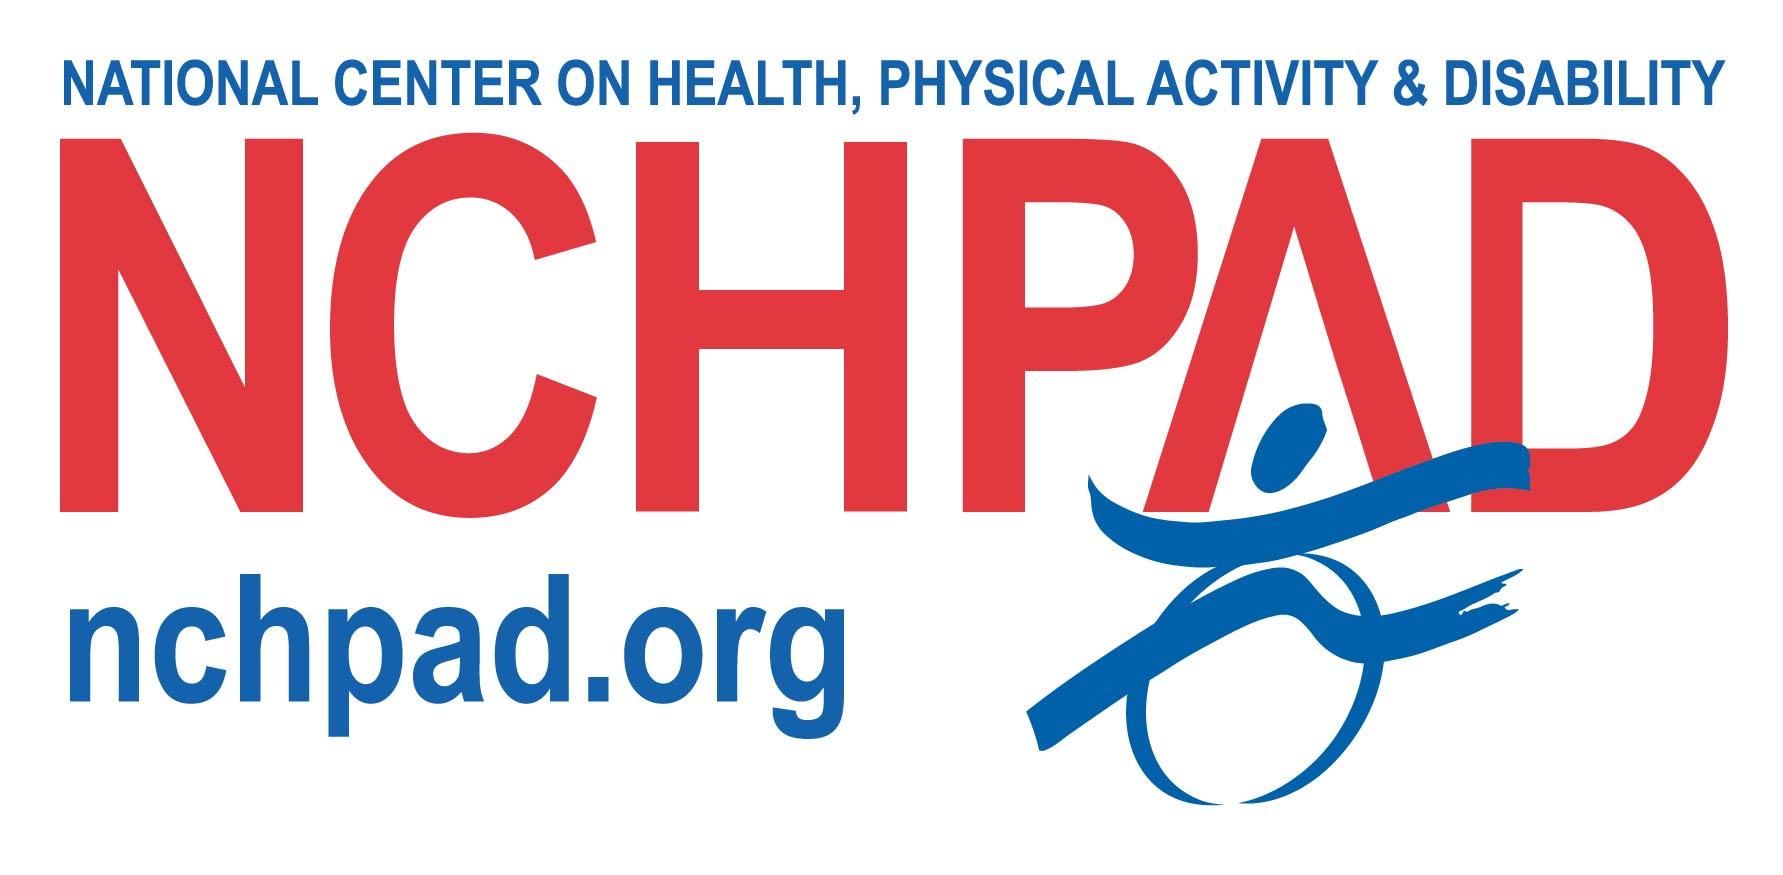 National Center on Health, Physical Activity & Disability logo